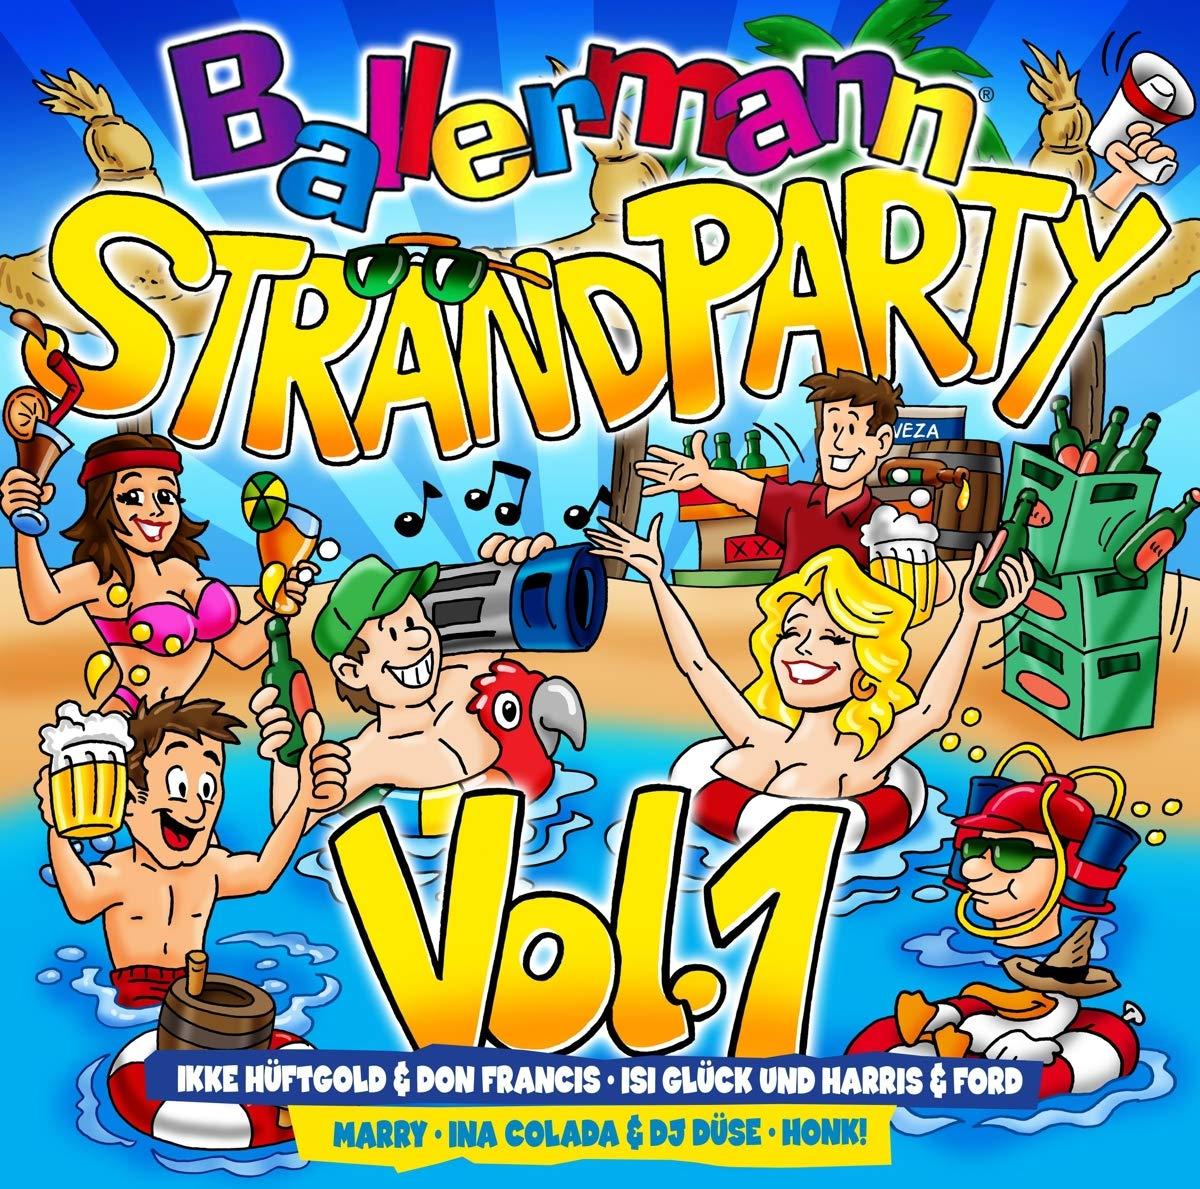 Ballermann Strandparty Vol.1 (2019) Mp3